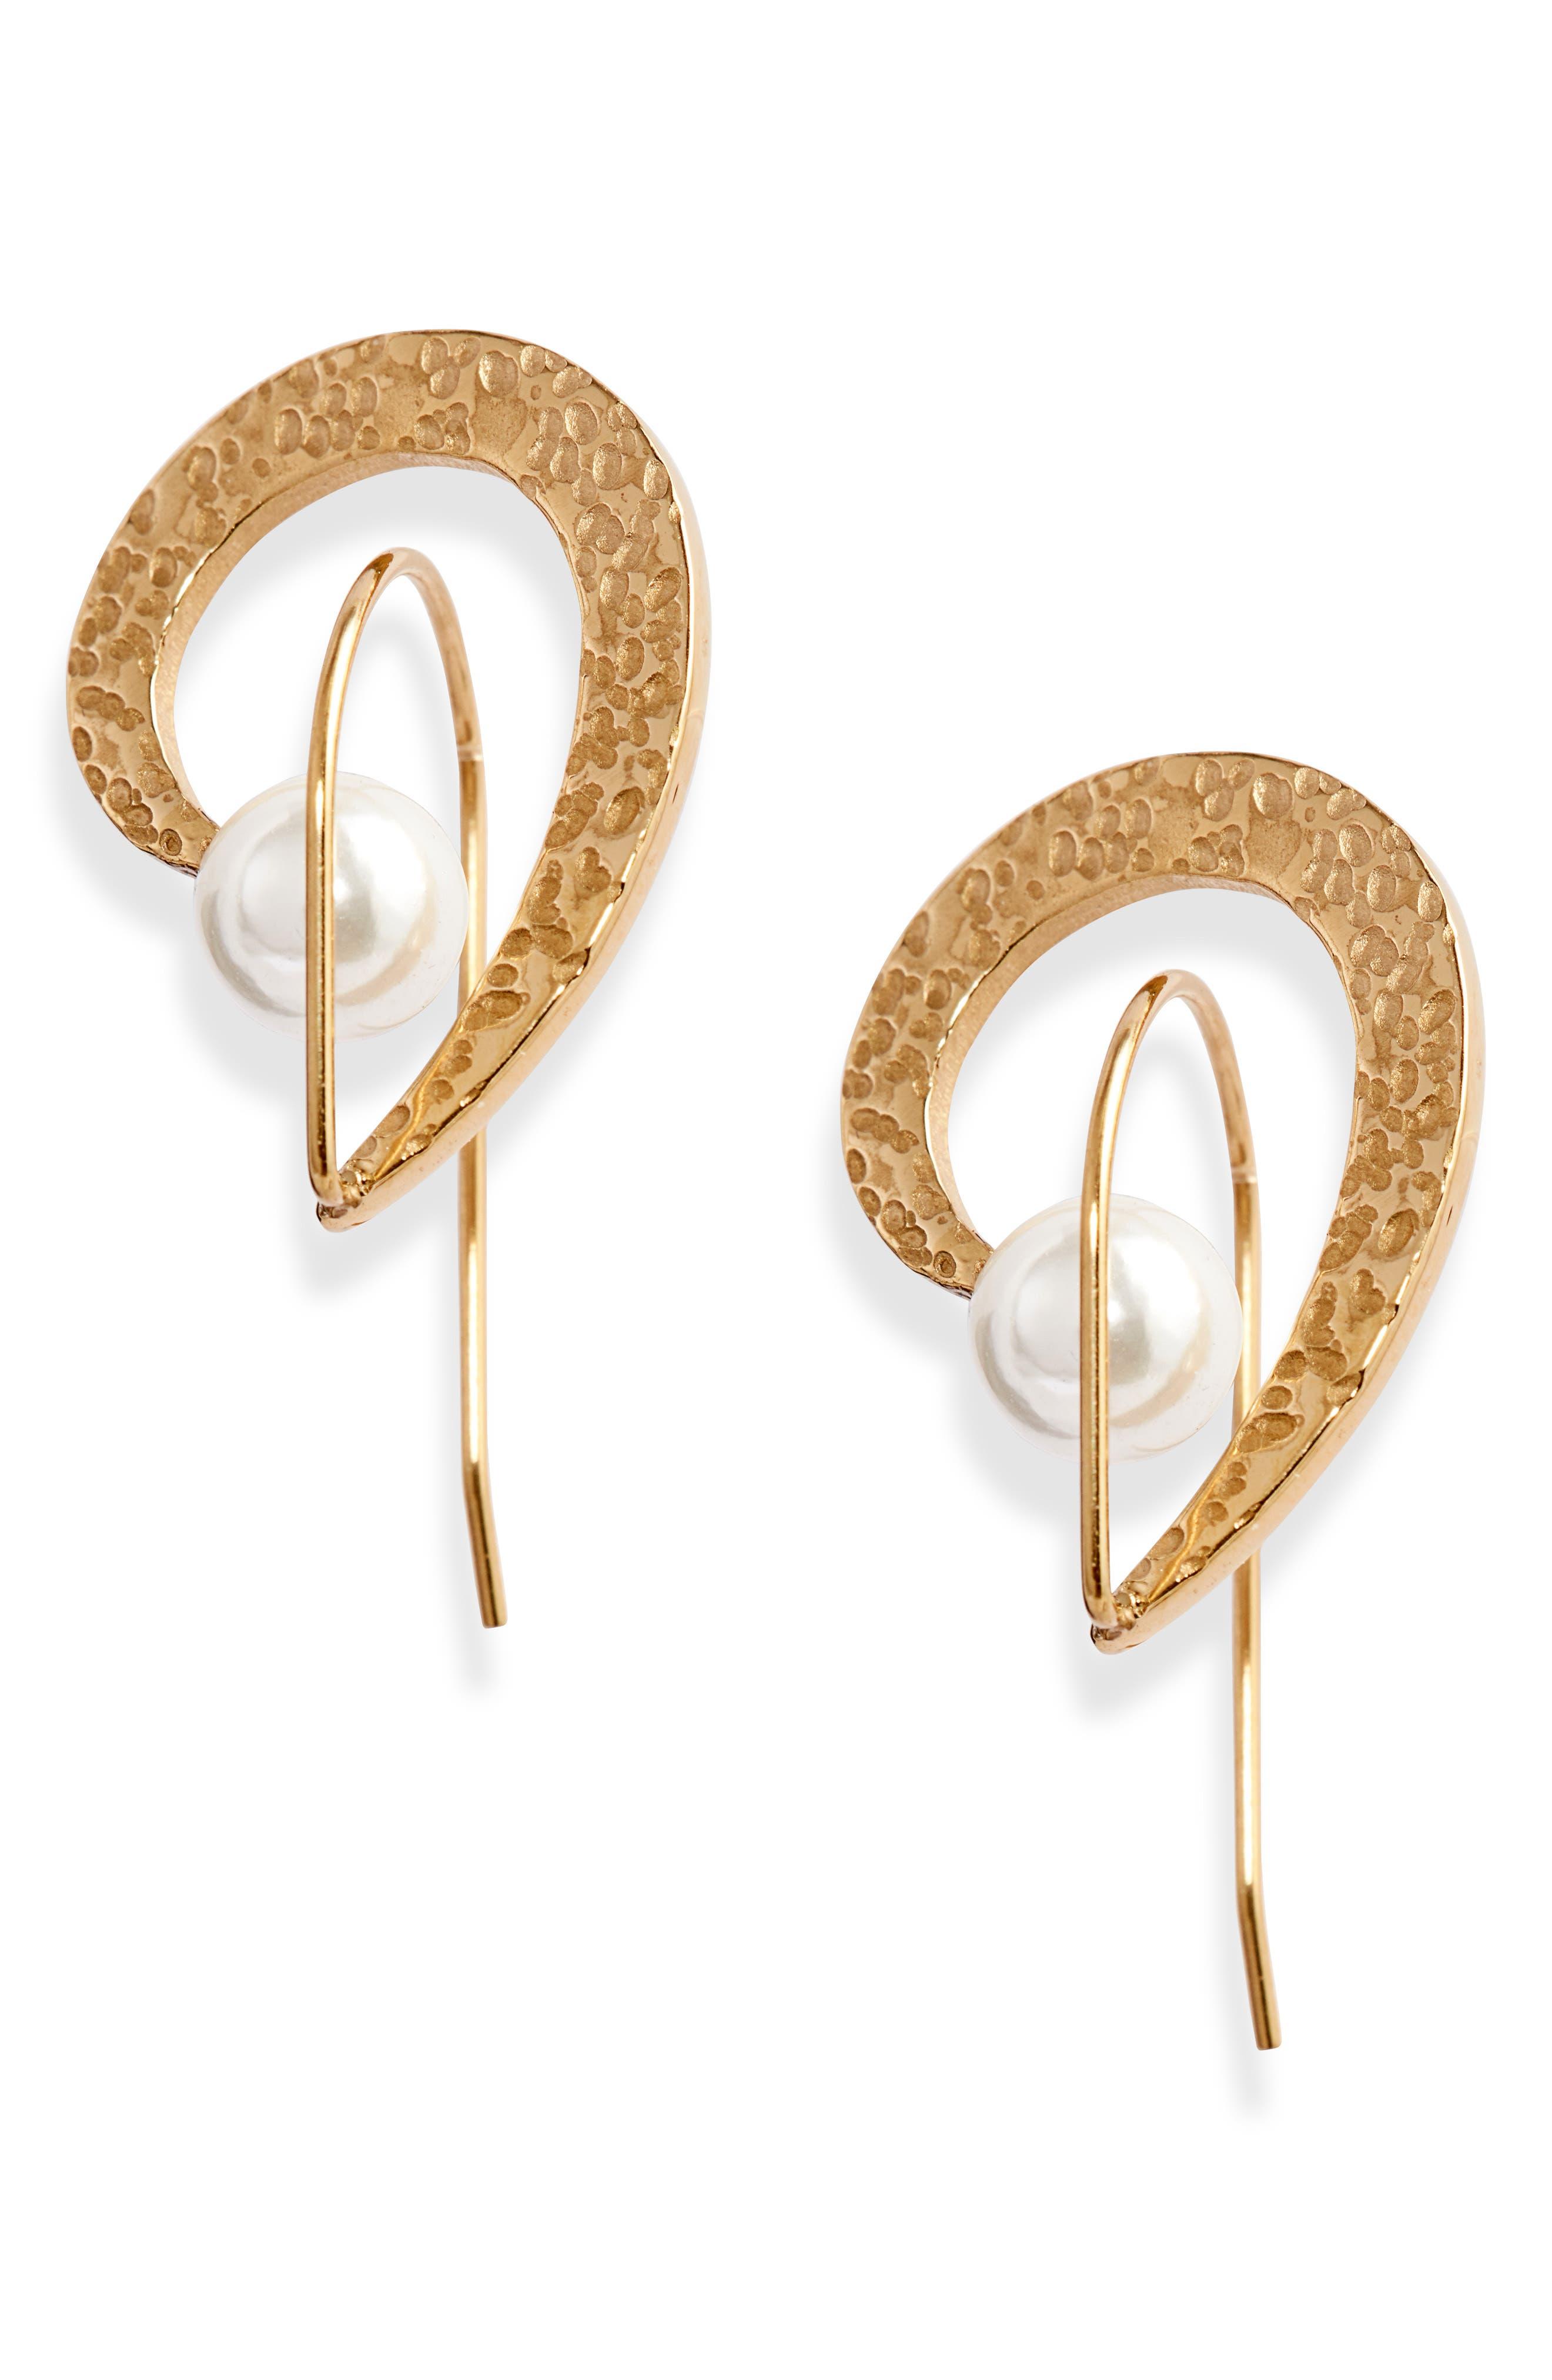 Hammered Orbit Earrings